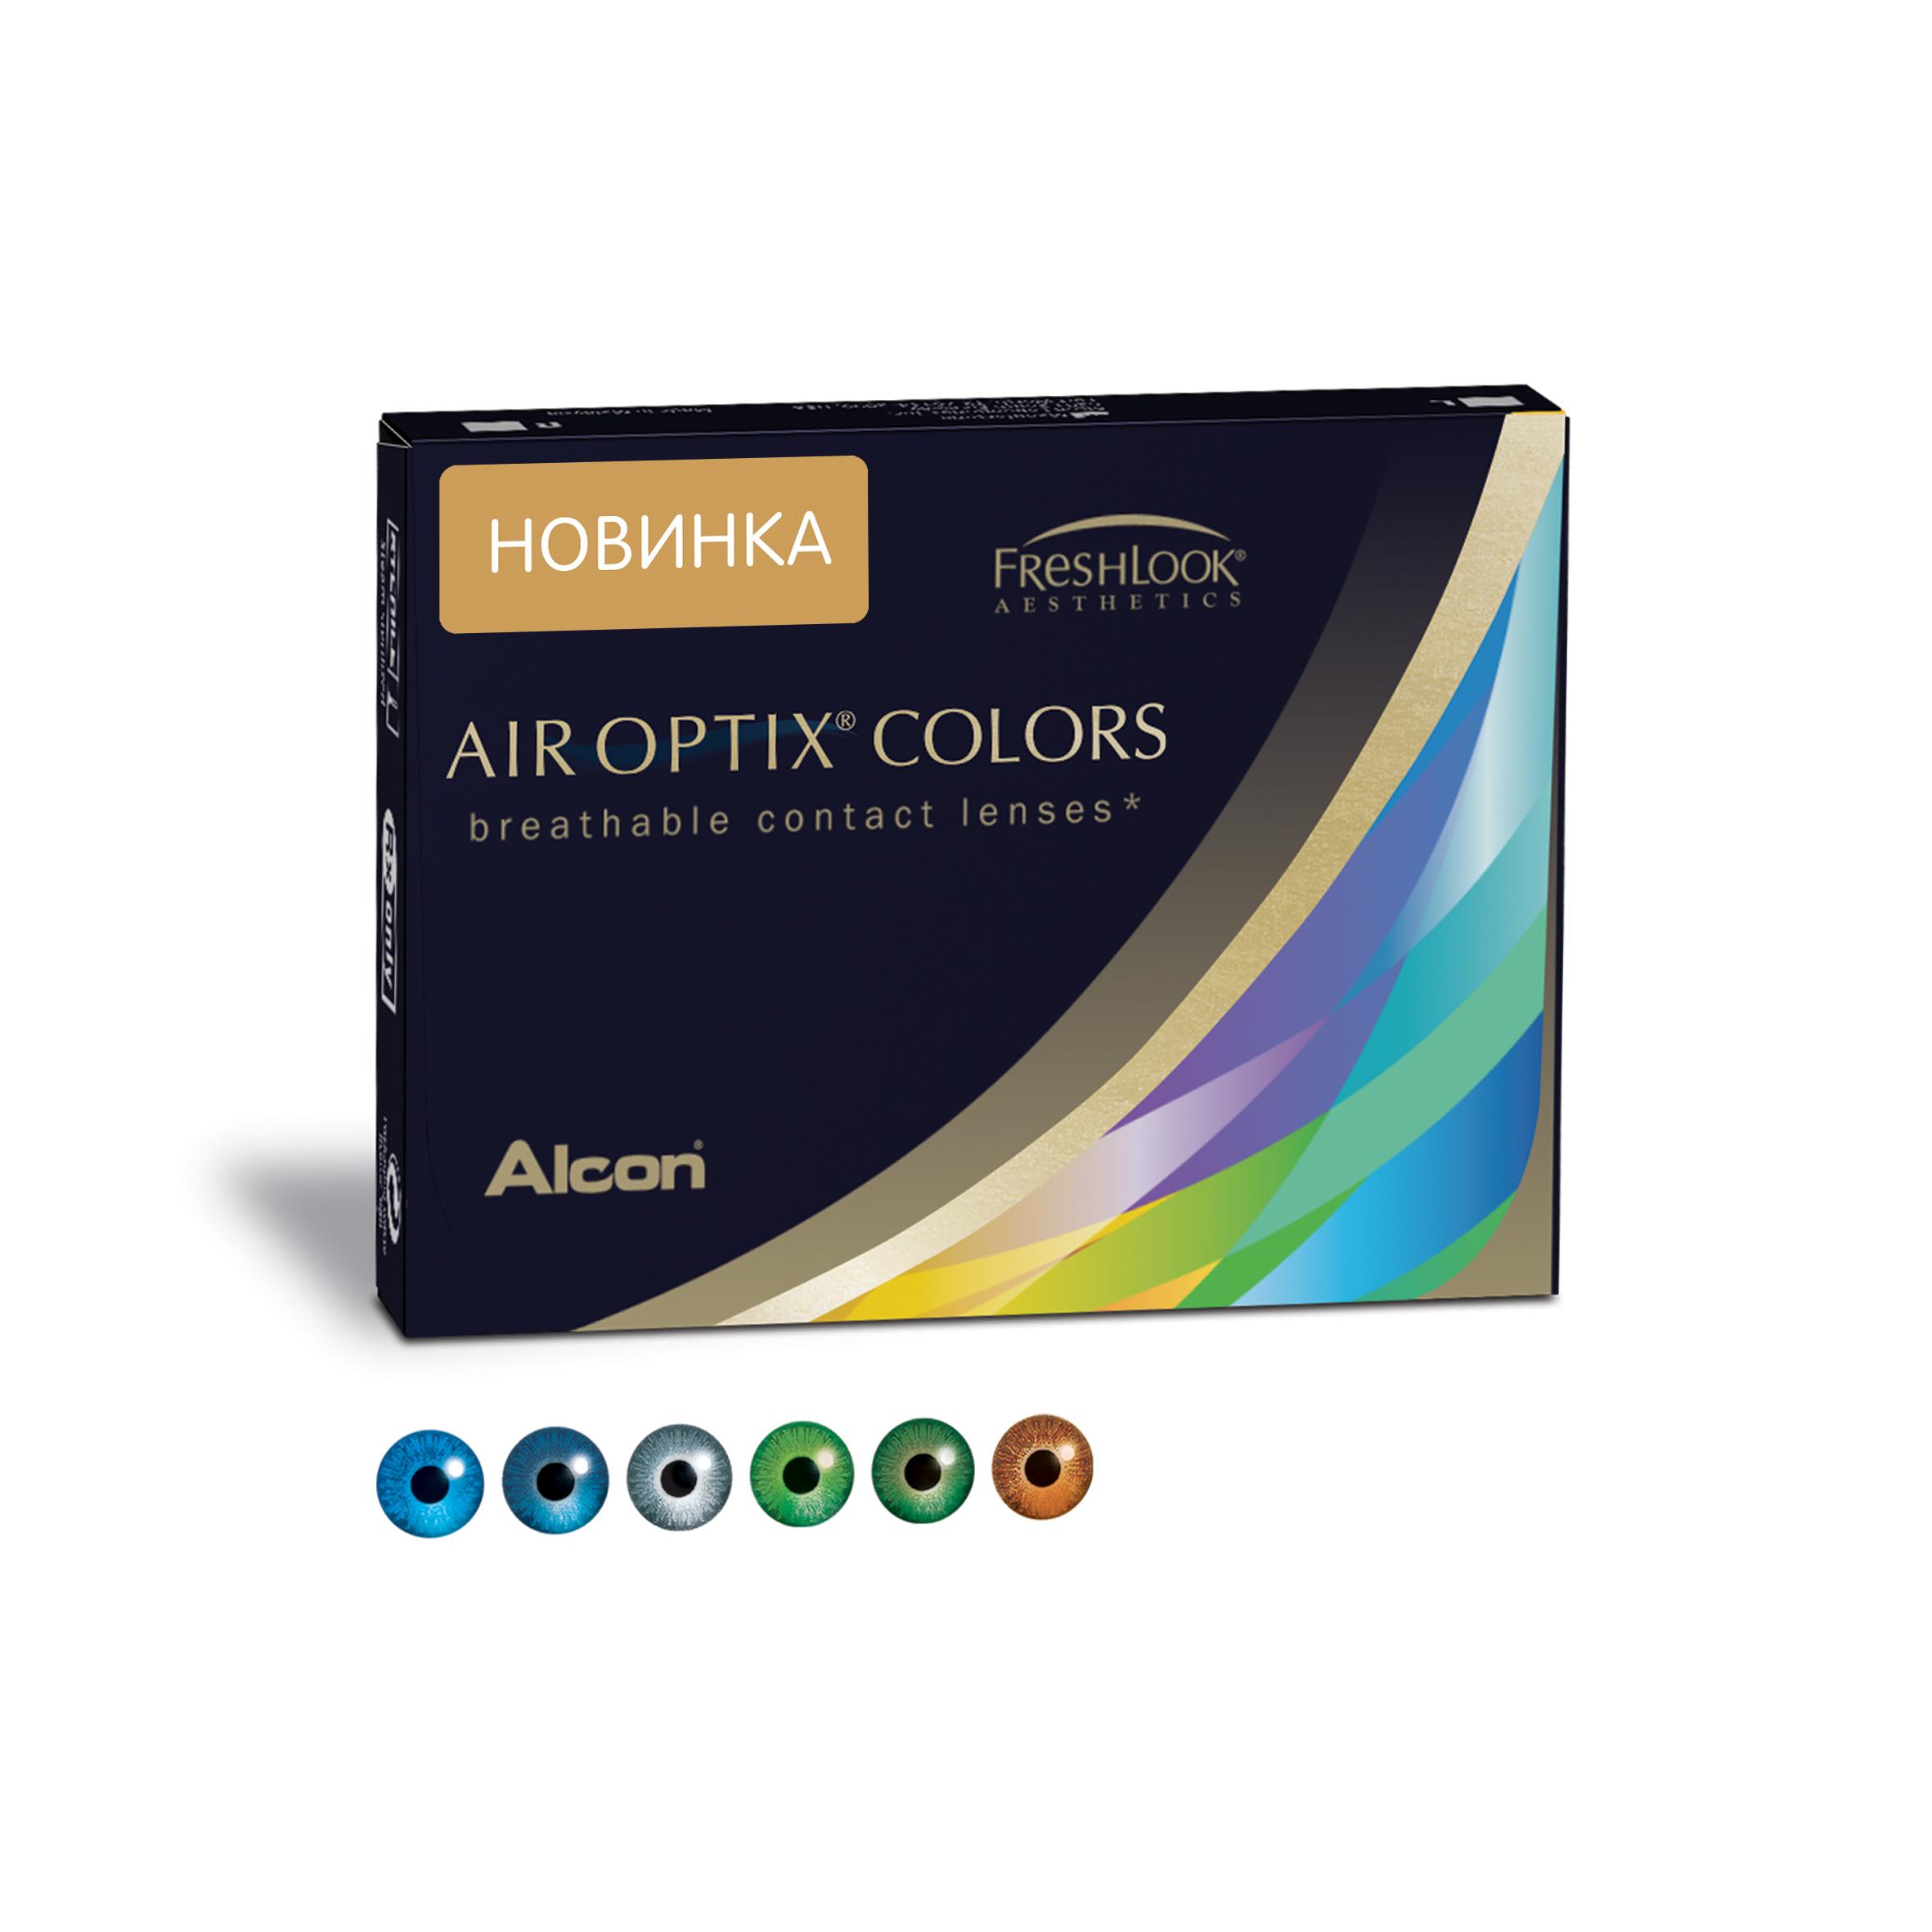 Аlcon контактные линзы Air Optix Colors 2 шт -3.00 Blue31746193Мягкие контактные линзы